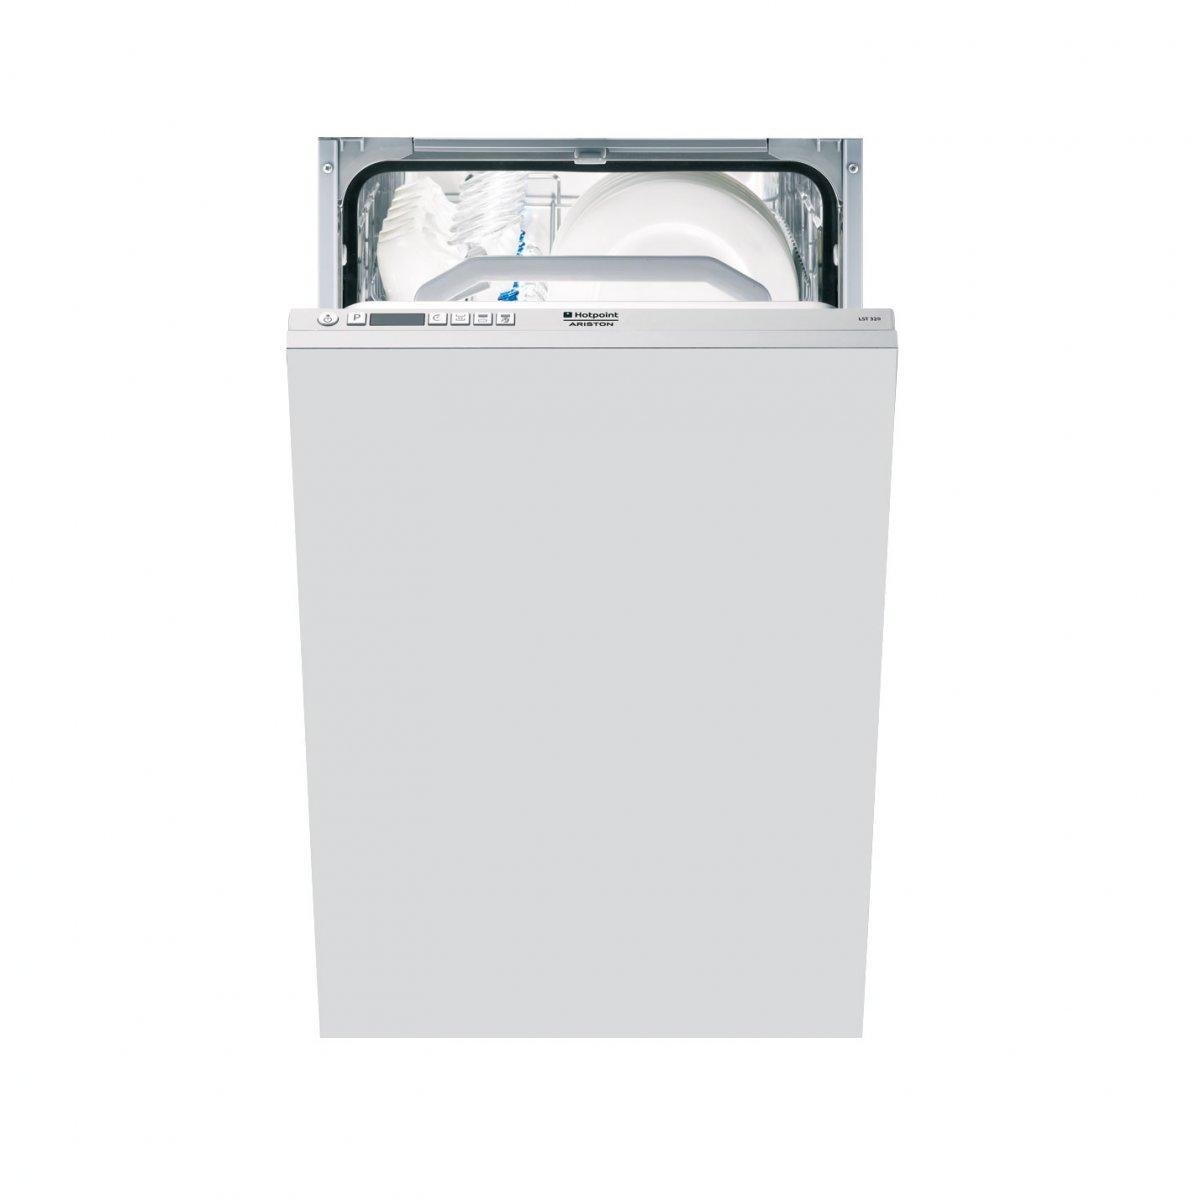 Schema Elettrico Lavastoviglie Whirlpool : Schema elettrico lavastoviglie ariston fare di una mosca